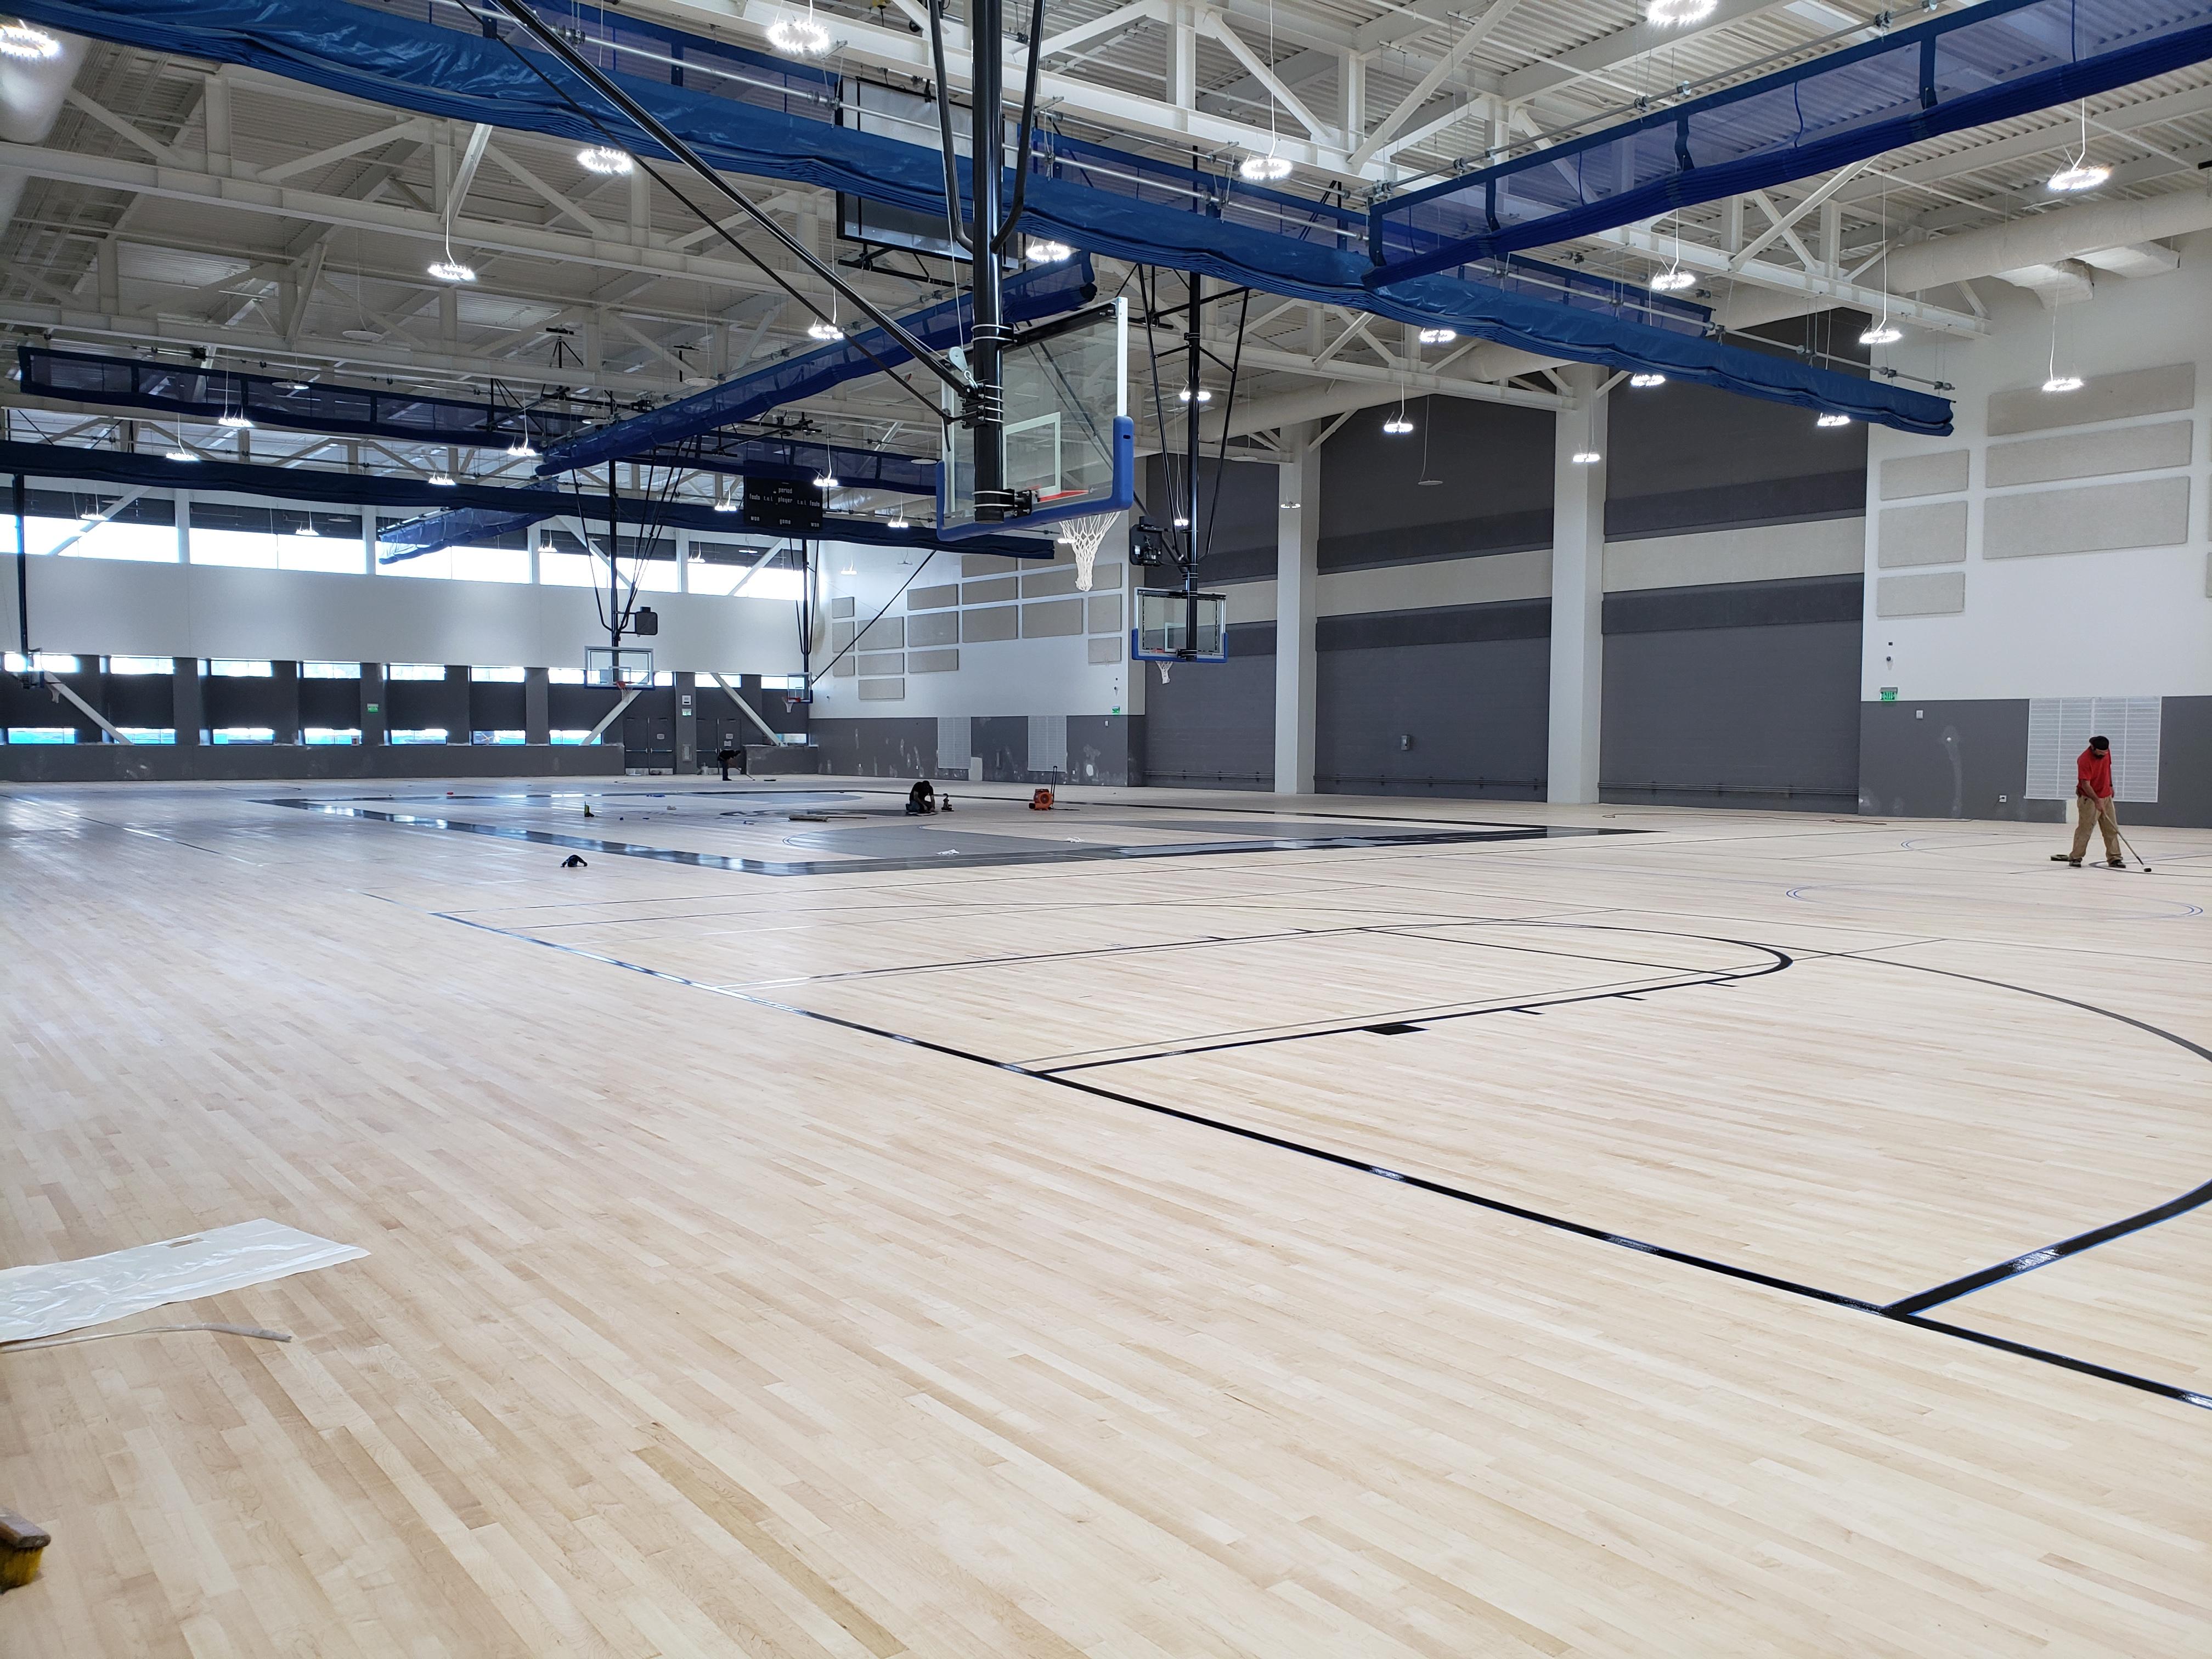 gym-floor-1